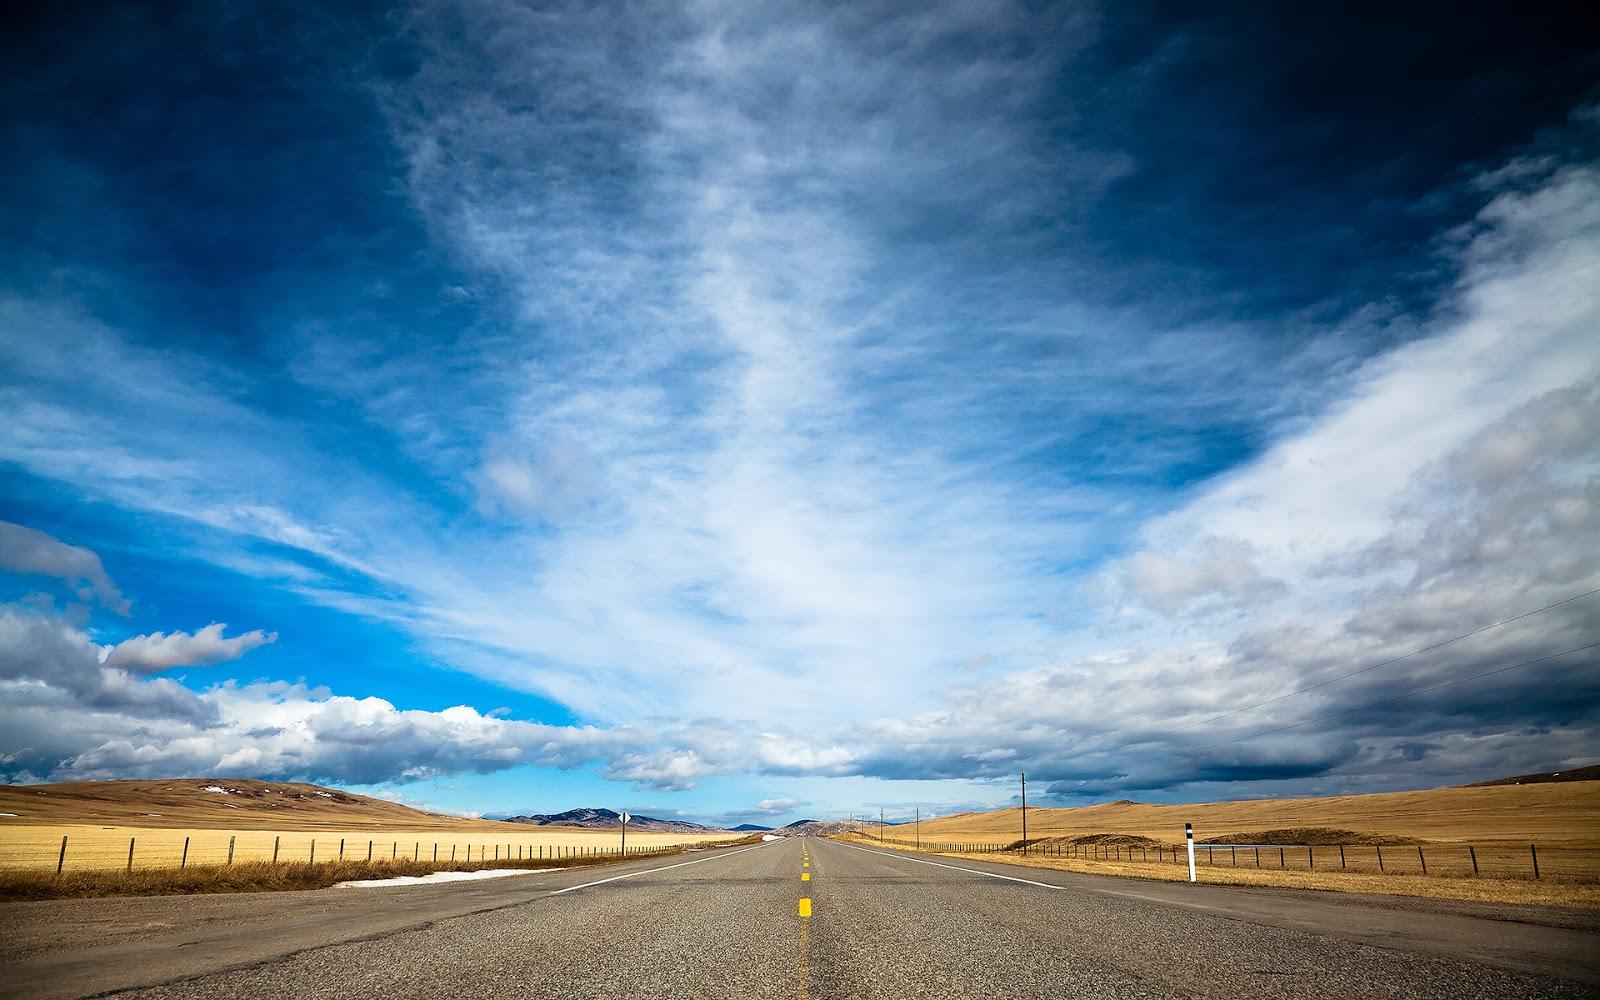 "<img src=""http://2.bp.blogspot.com/-50HIkU0XbH8/Ut_qve-uEzI/AAAAAAAAJvM/Jr6d03lltDc/s1600/road-and-sky.jpg"" alt=""road and sky"" />"